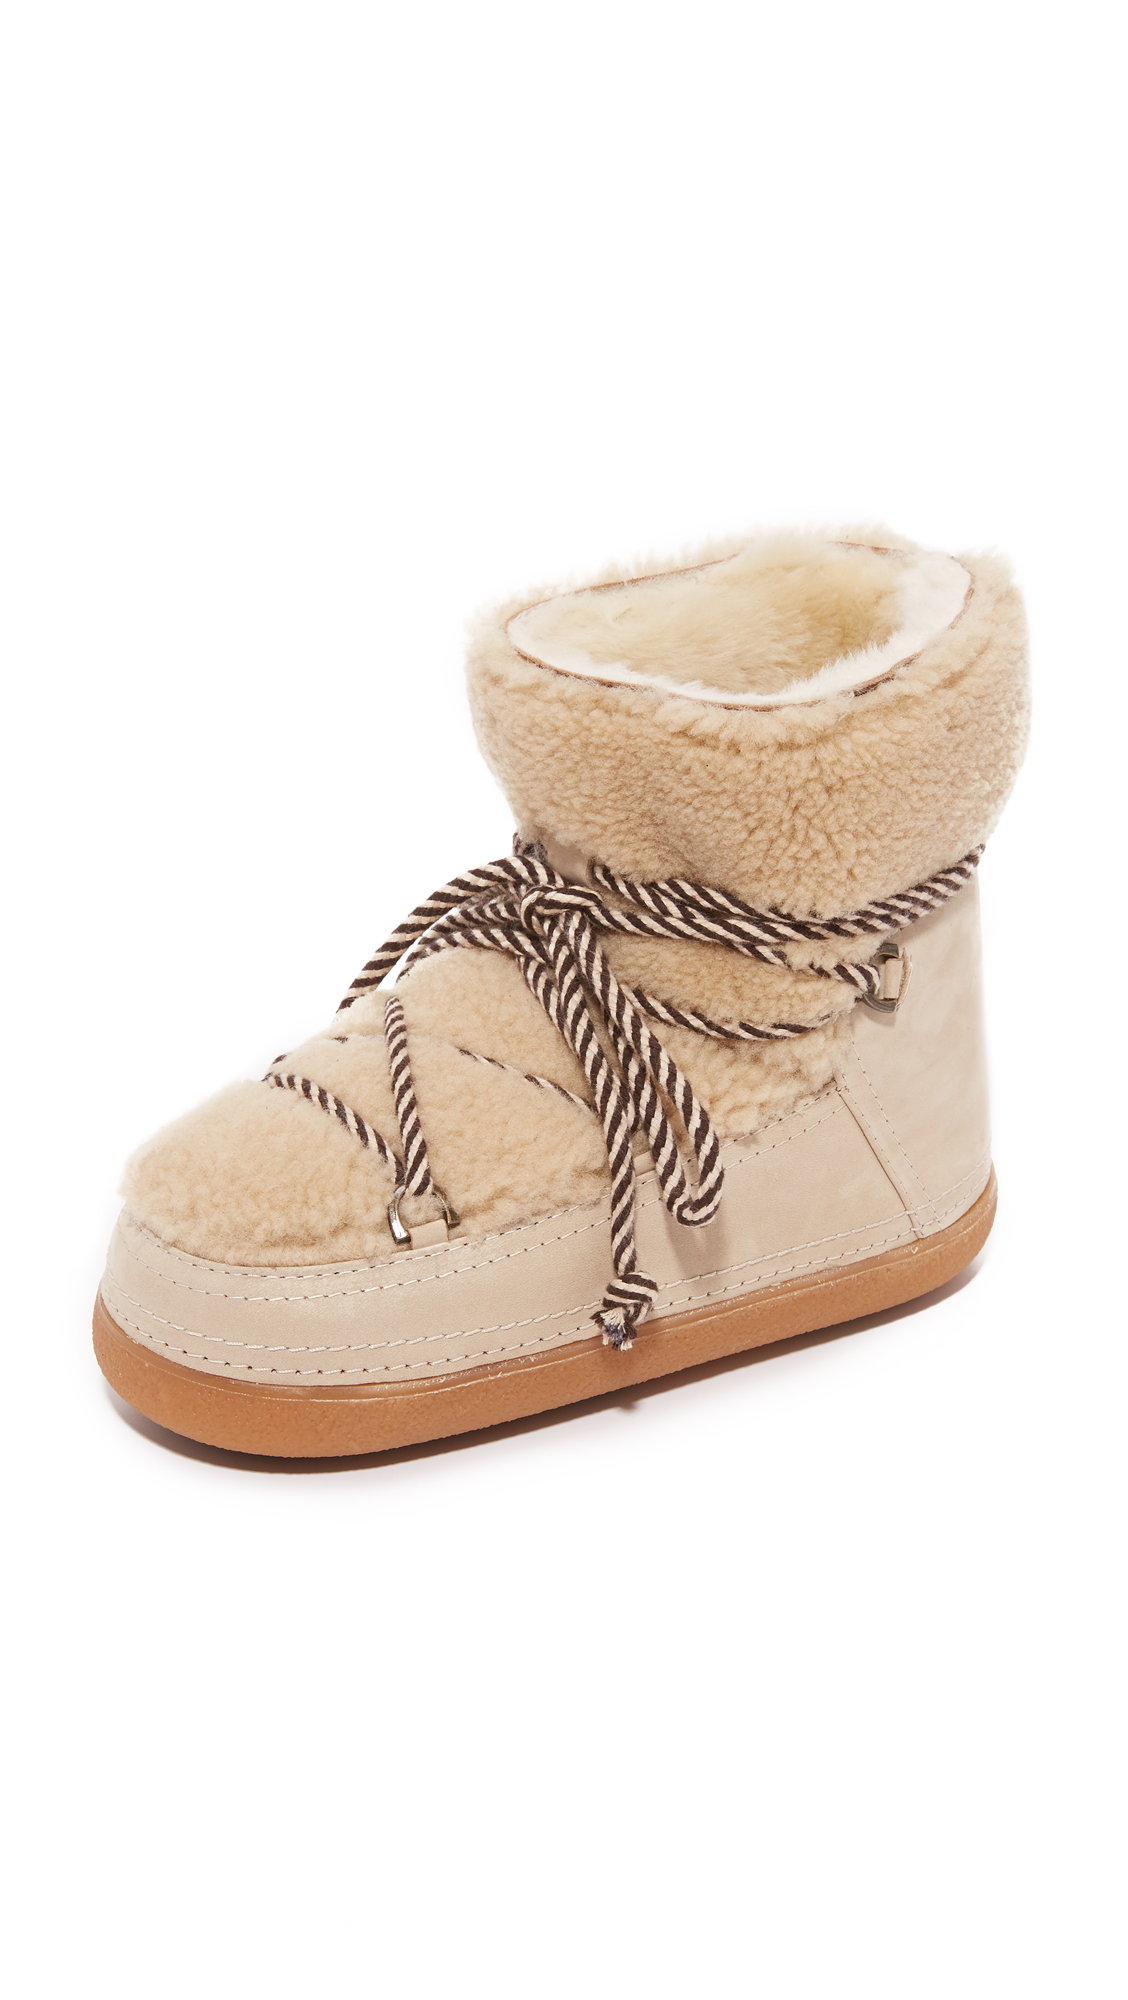 Inuiki Curly Shearling Booties - Beige